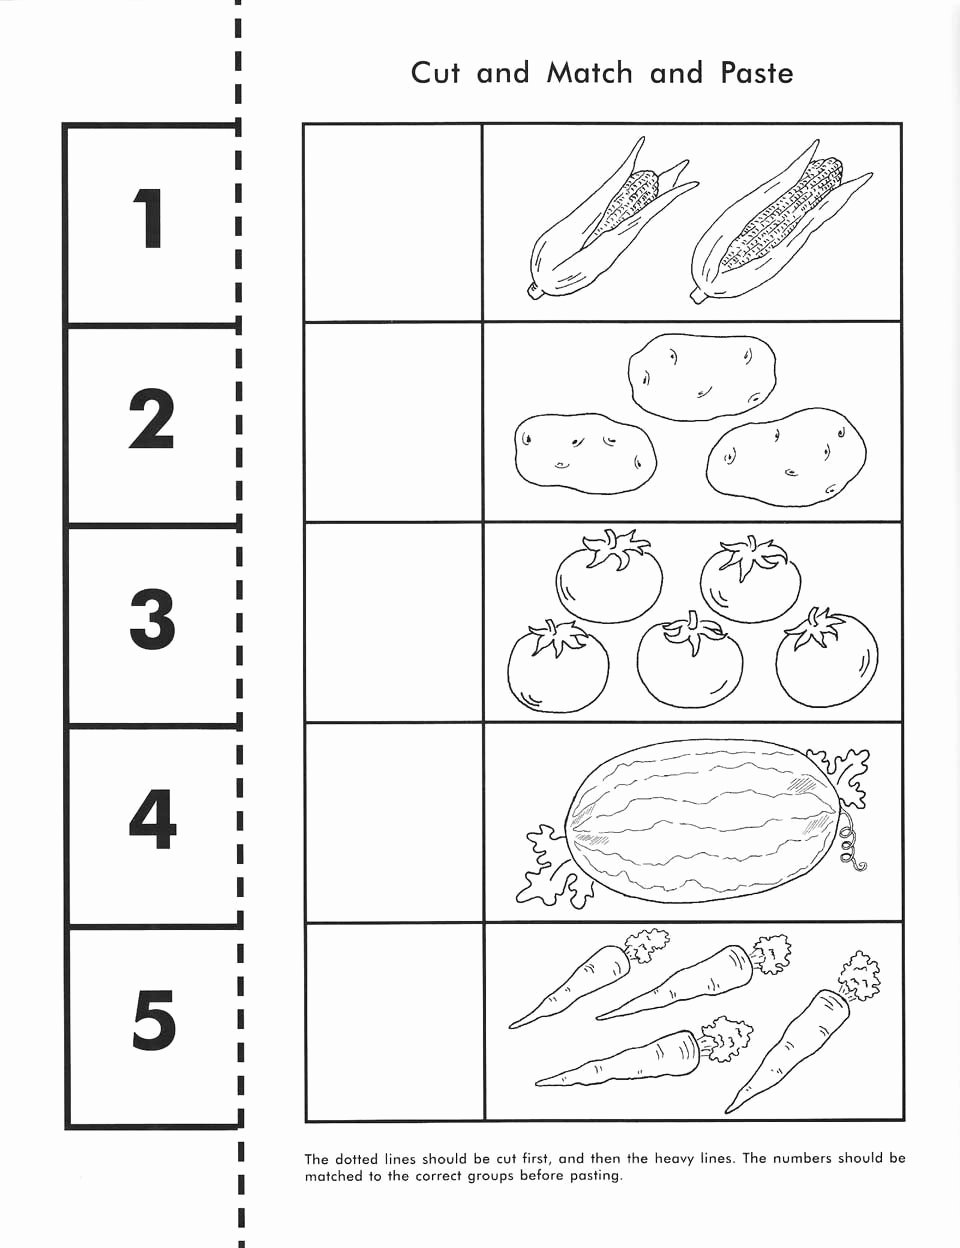 Preschool Cut and Paste Worksheets top Home Education Journal Rod & Staff Preschool Workbooks